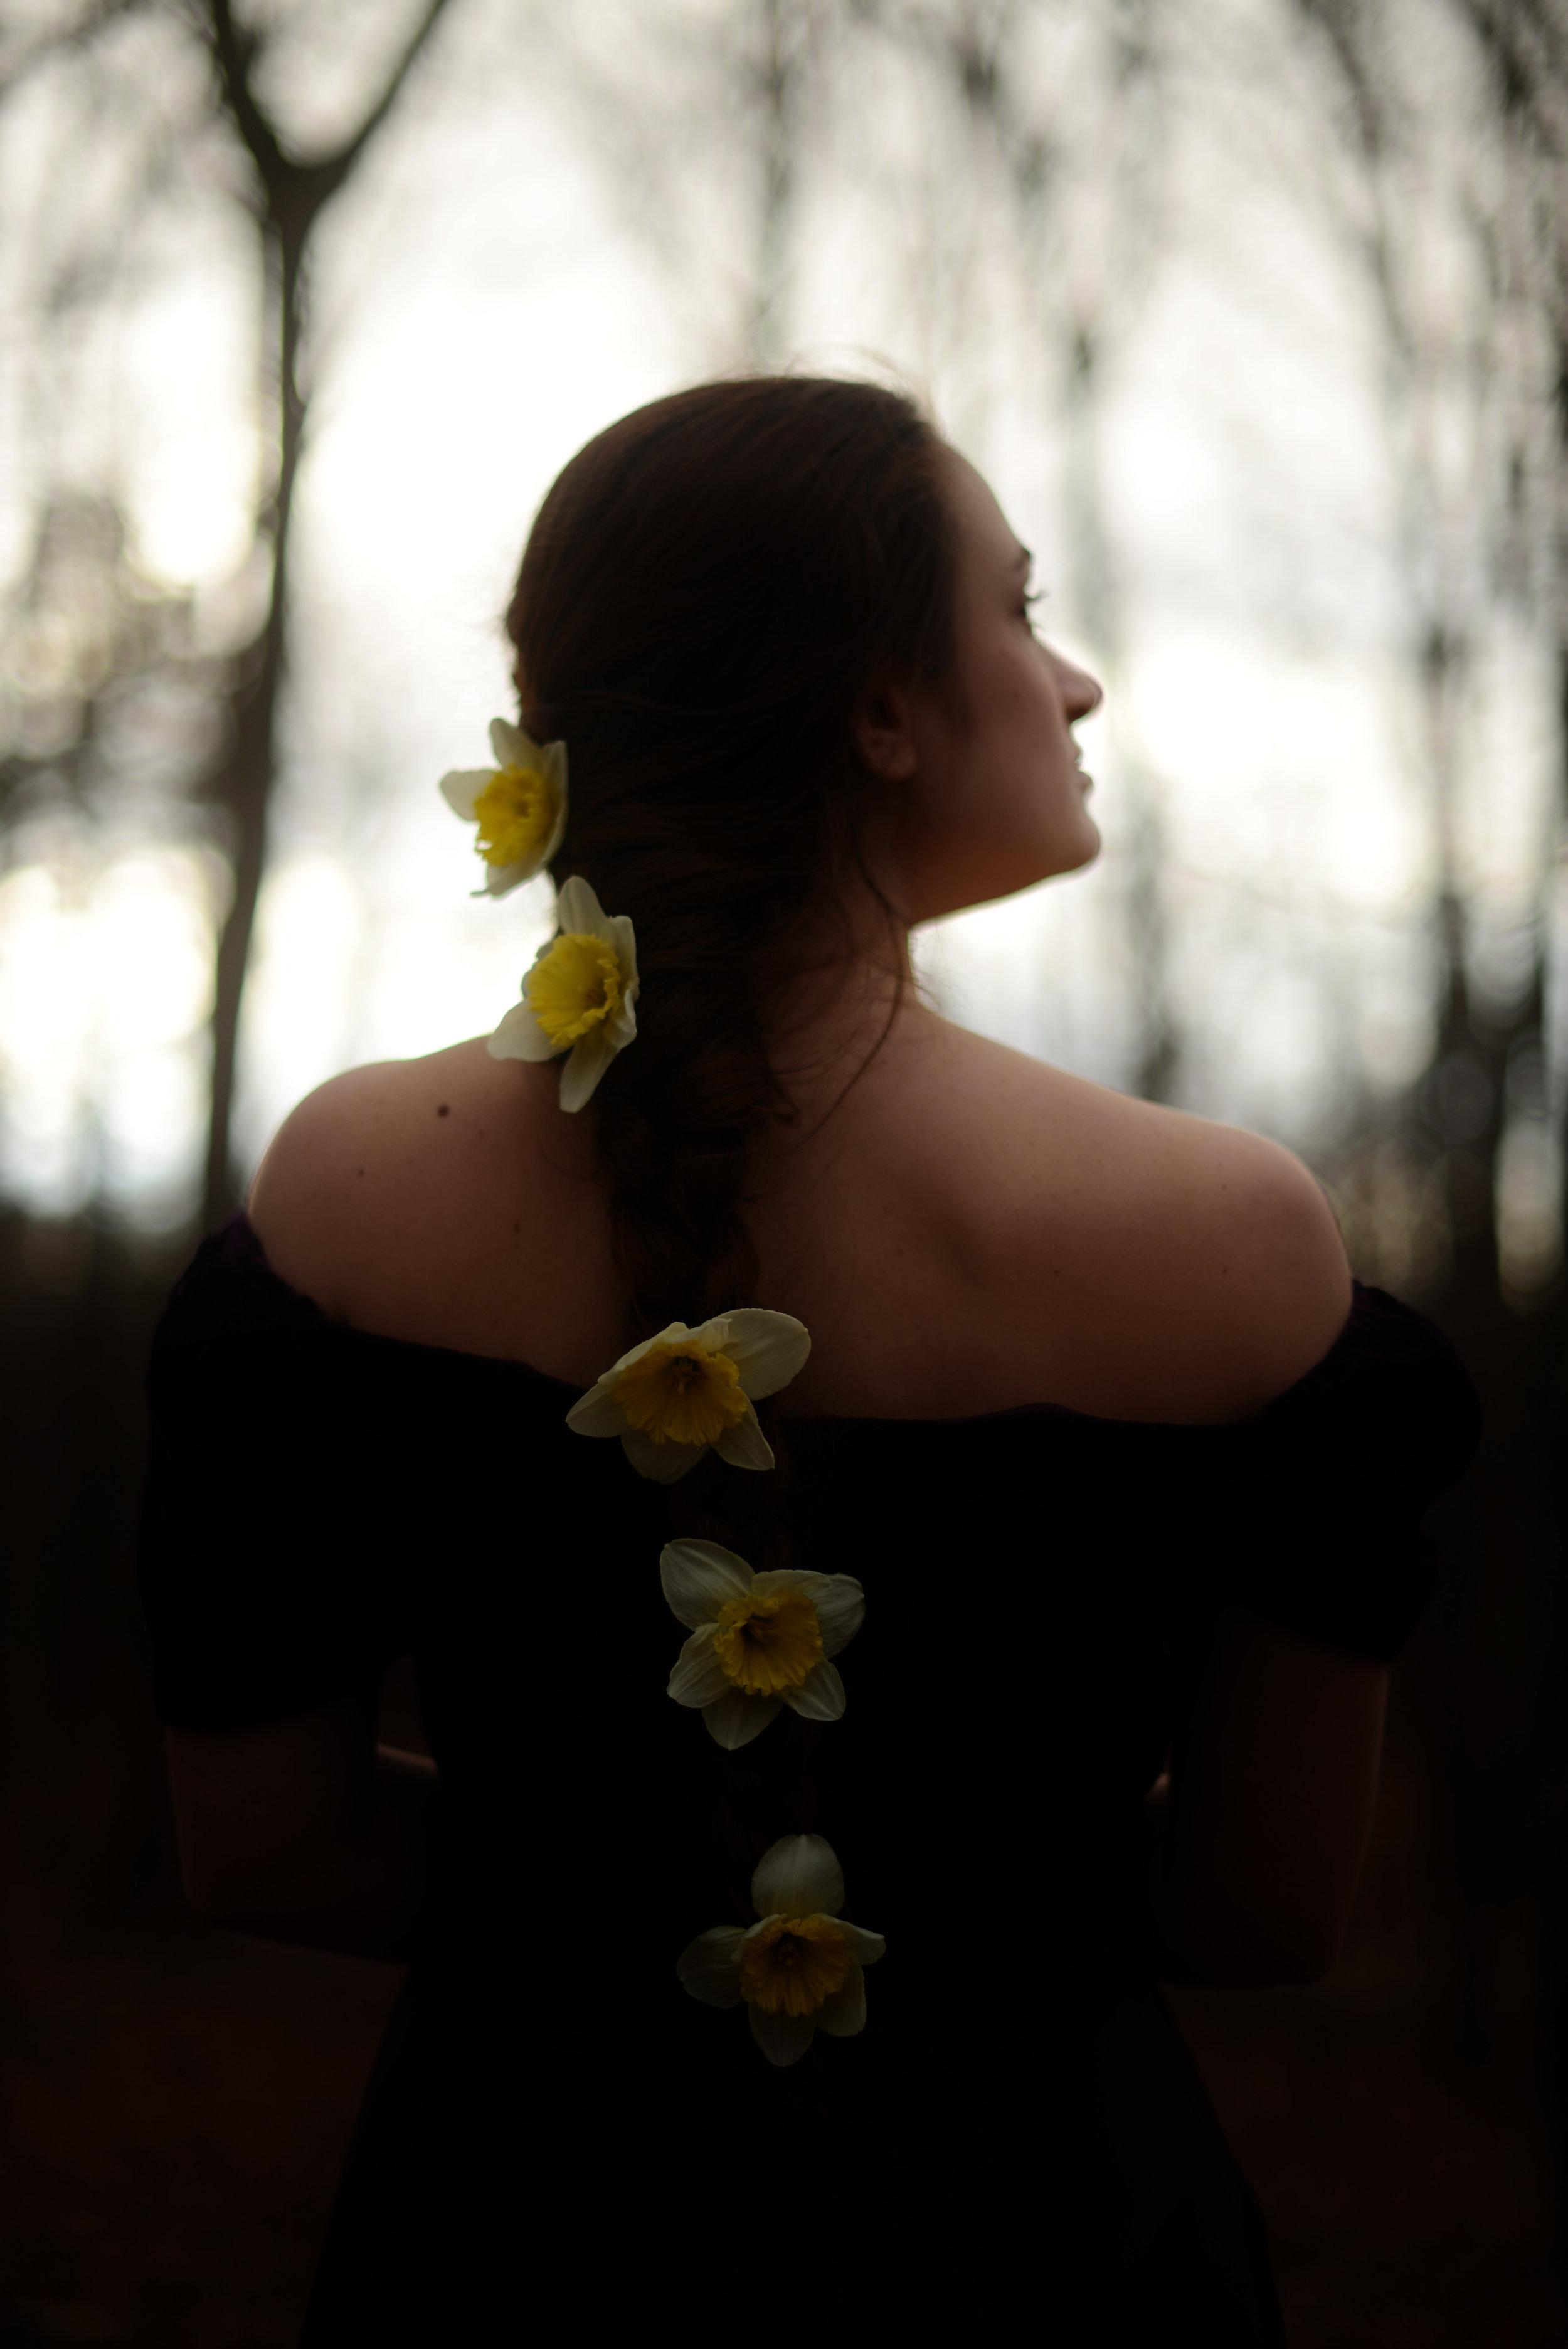 LaRue Photography Fairytale Fine art portrait photographer loudoun county virginia